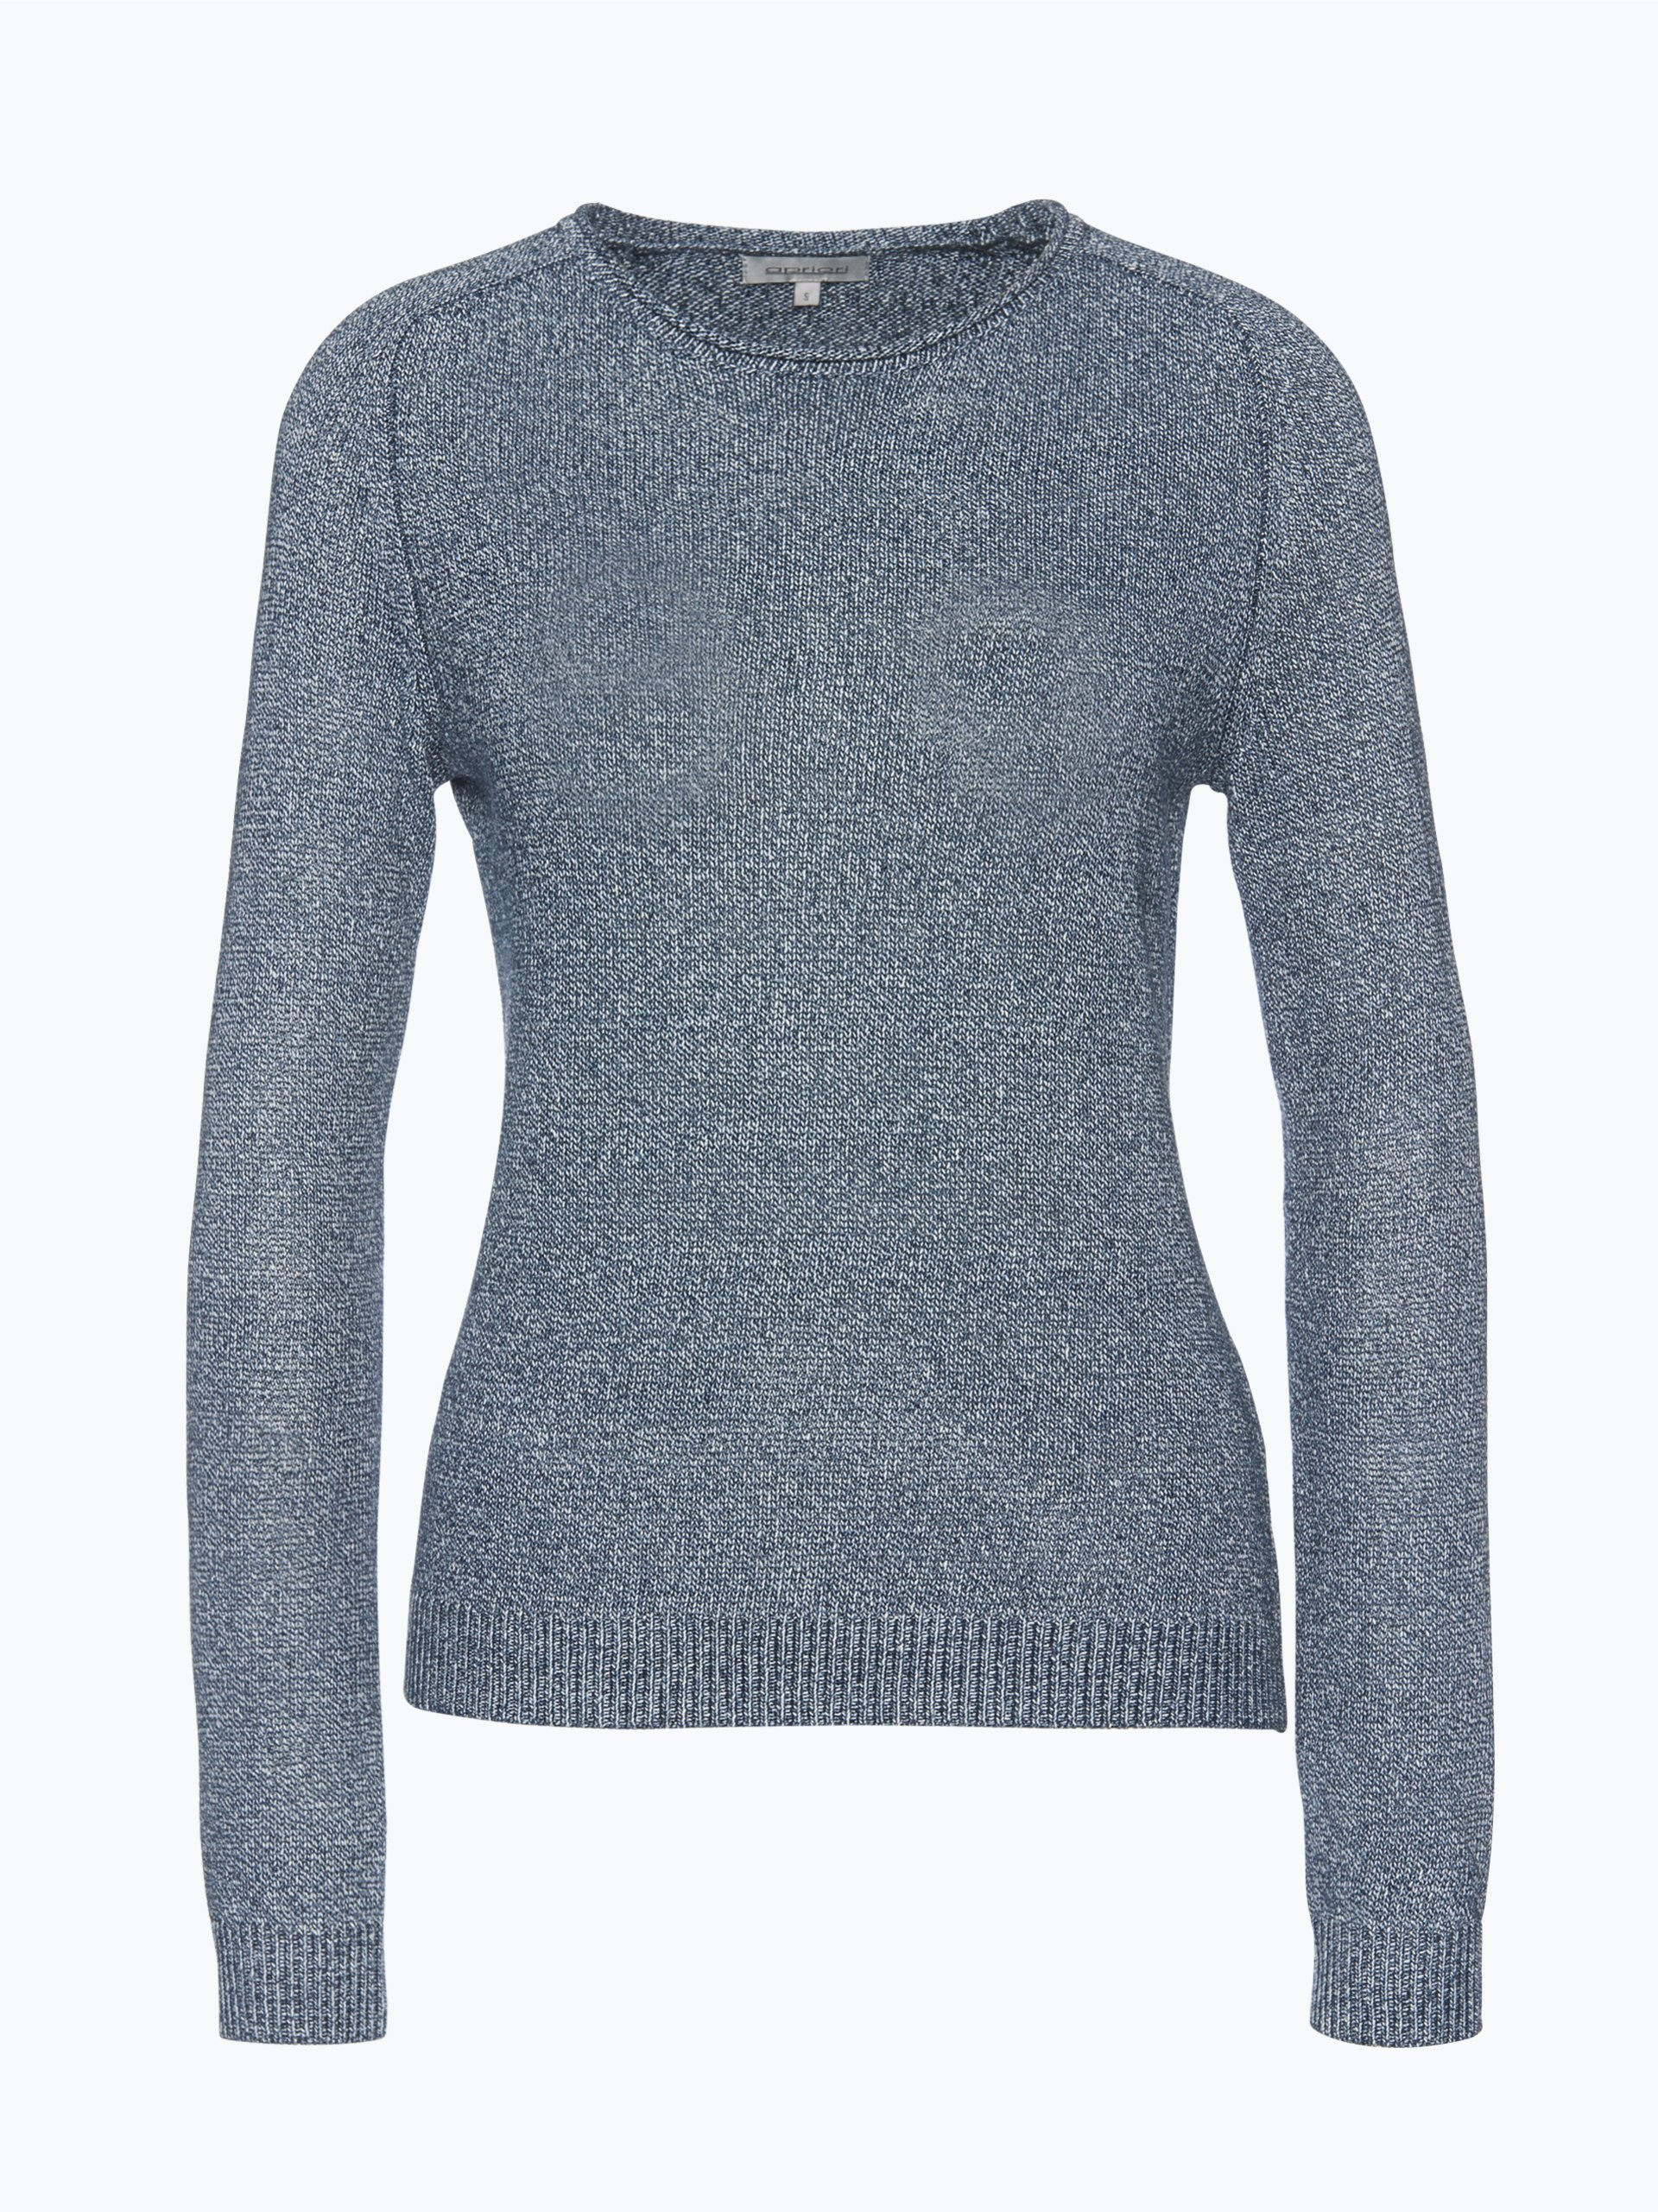 apriori damen pullover mit leinen anteil blau uni online. Black Bedroom Furniture Sets. Home Design Ideas